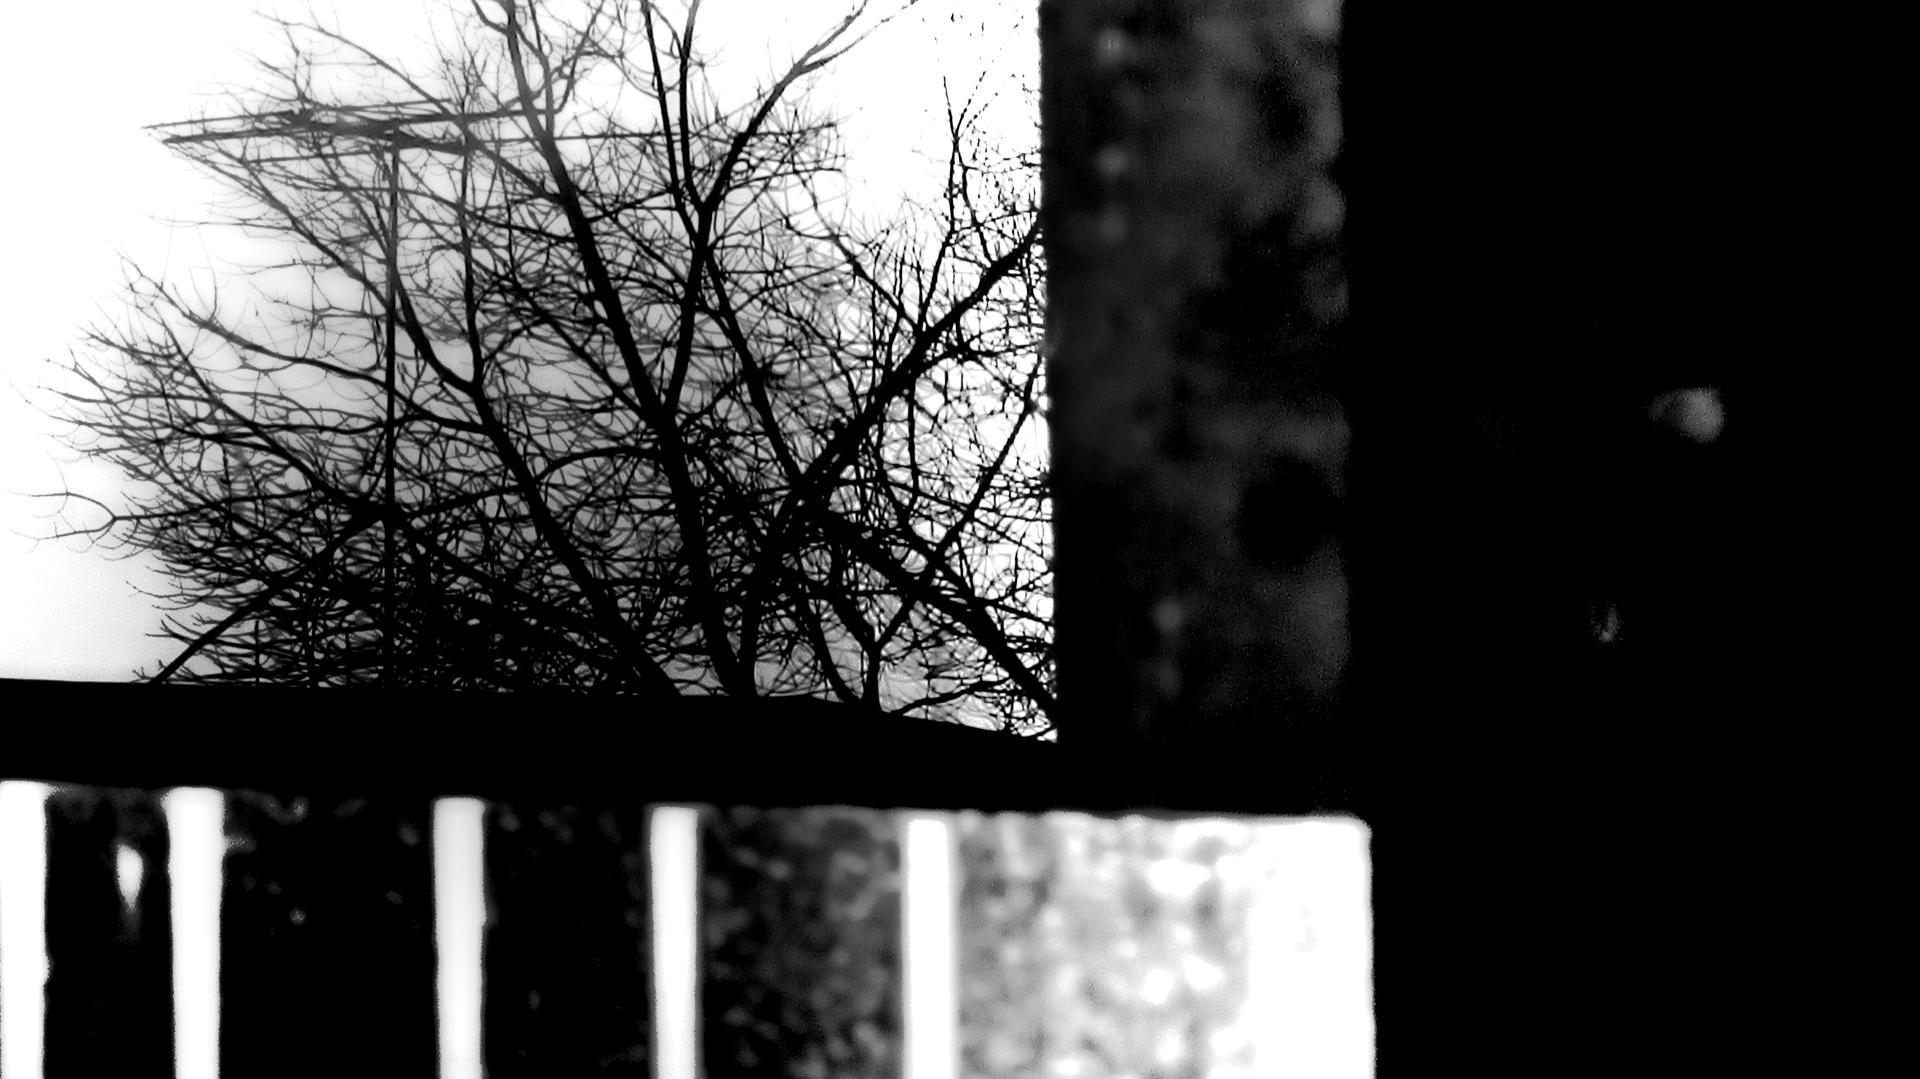 winter1 image